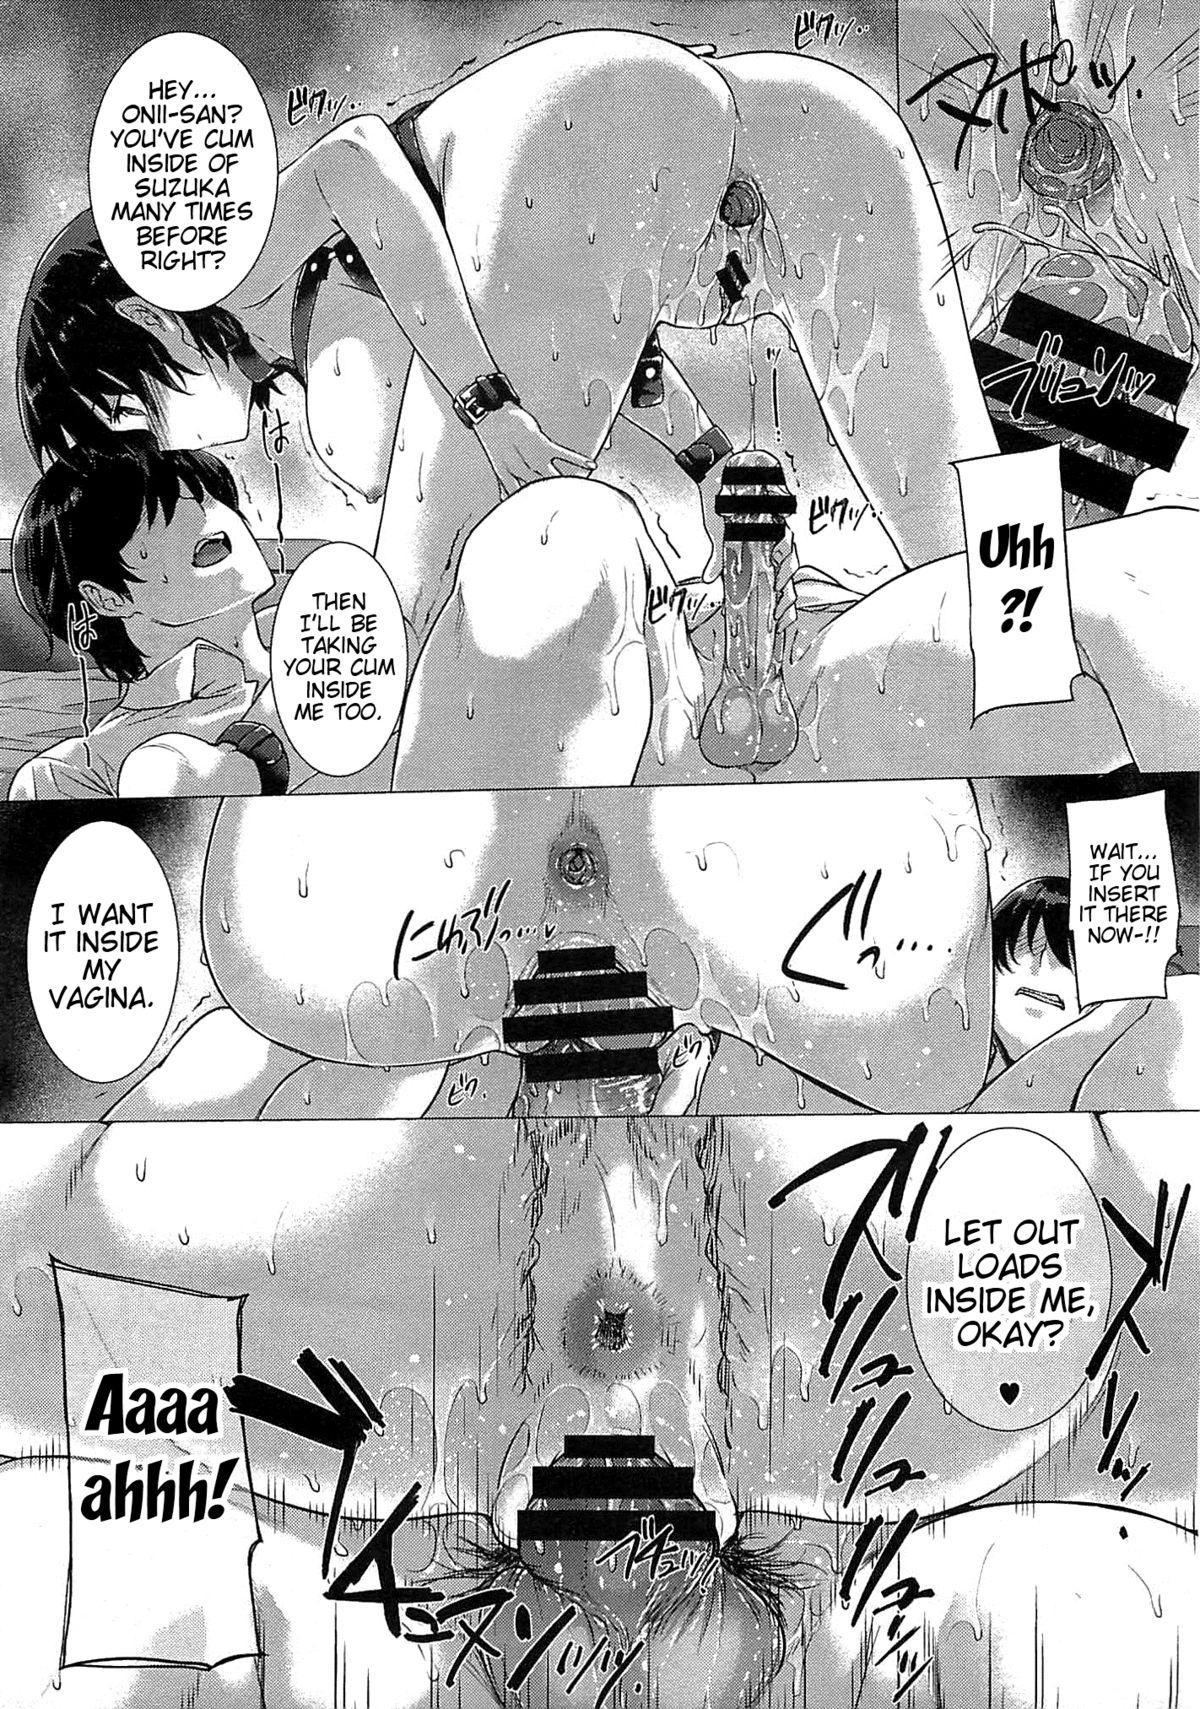 [Katsurai Yoshiaki] Kanojo wa Kazoku de Koibito de Ch. 1-3   She's My Family And My Lover Ch. 1-3 [English] {doujin-moe.us} 51